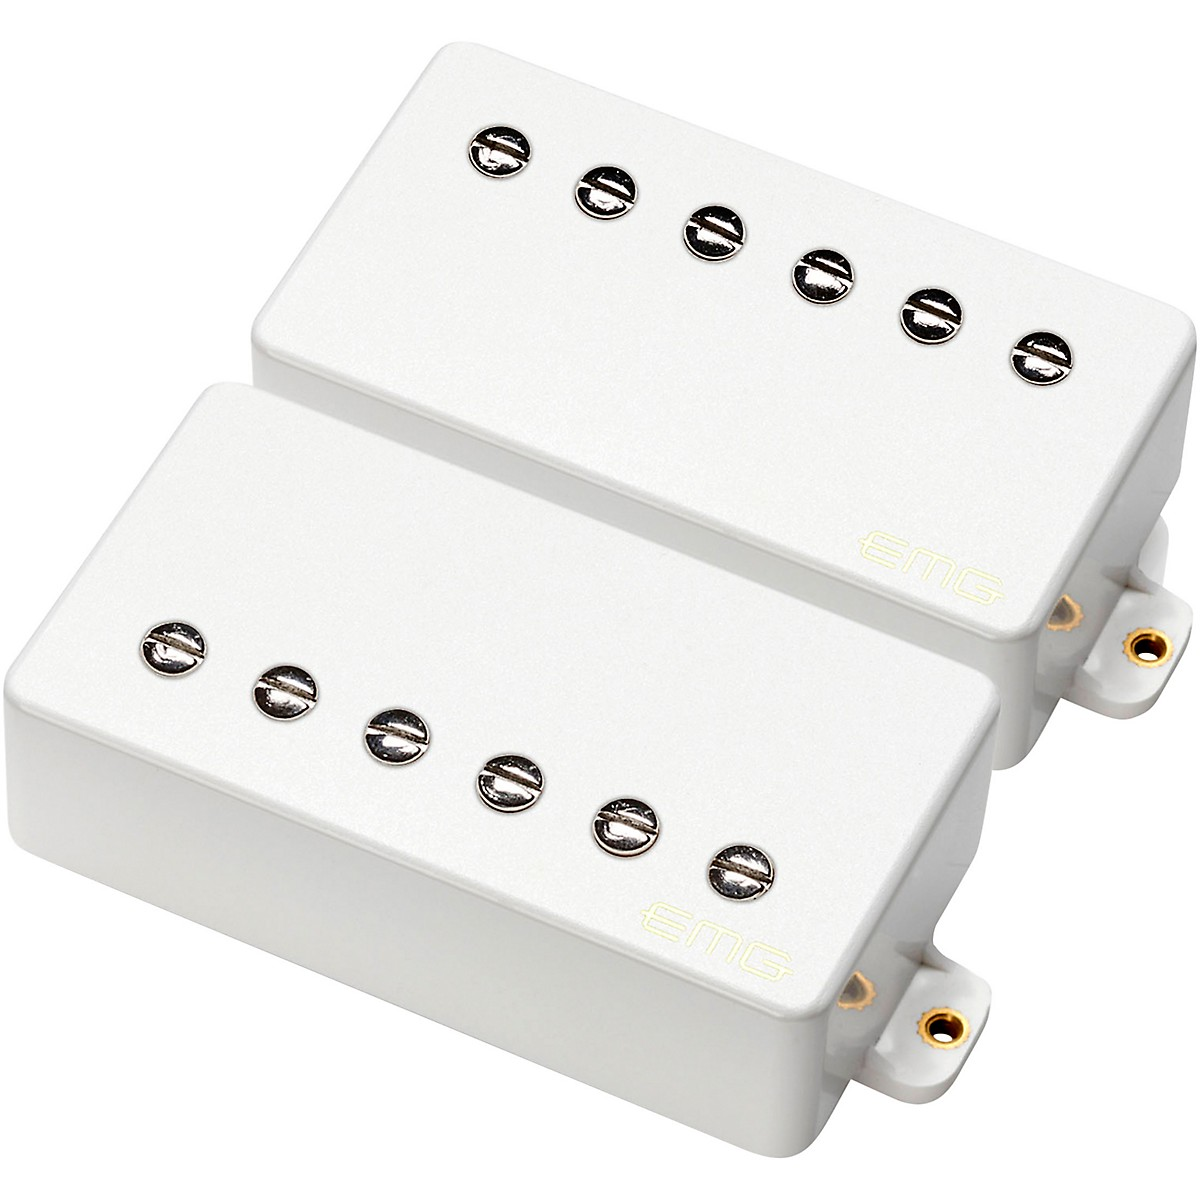 EMG REV Set Prashant Aswani Signature Pickup Set for Electric Guitar